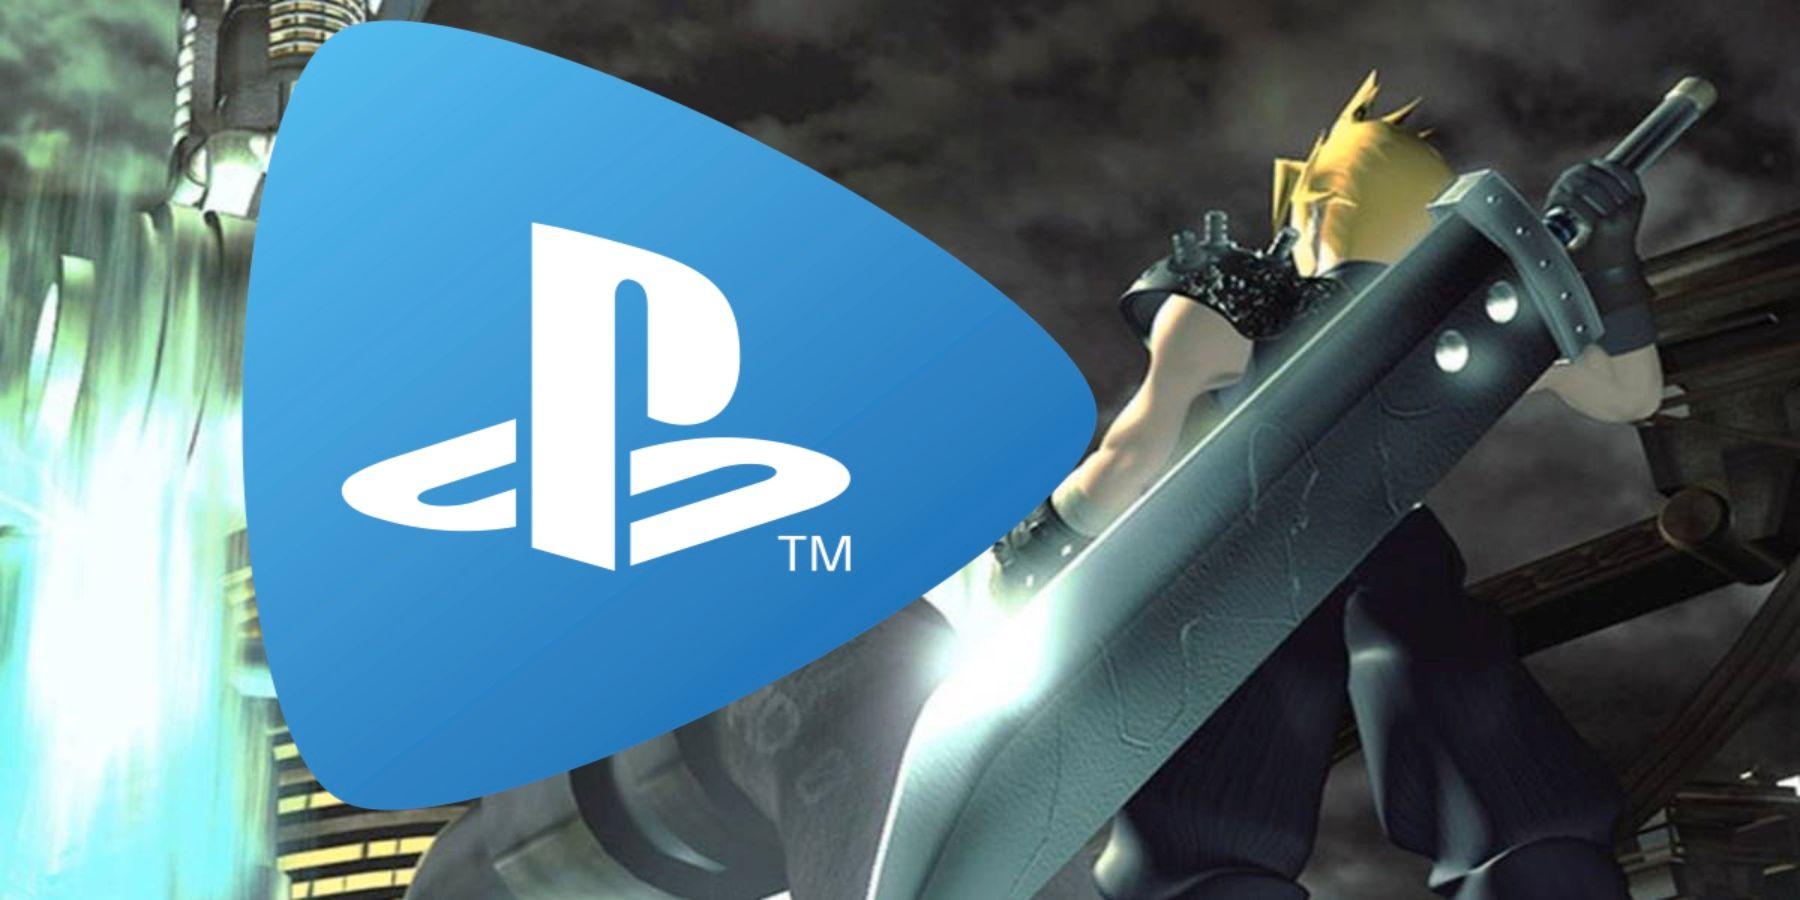 Final Fantasy oyunları PlayStation'a geliyor